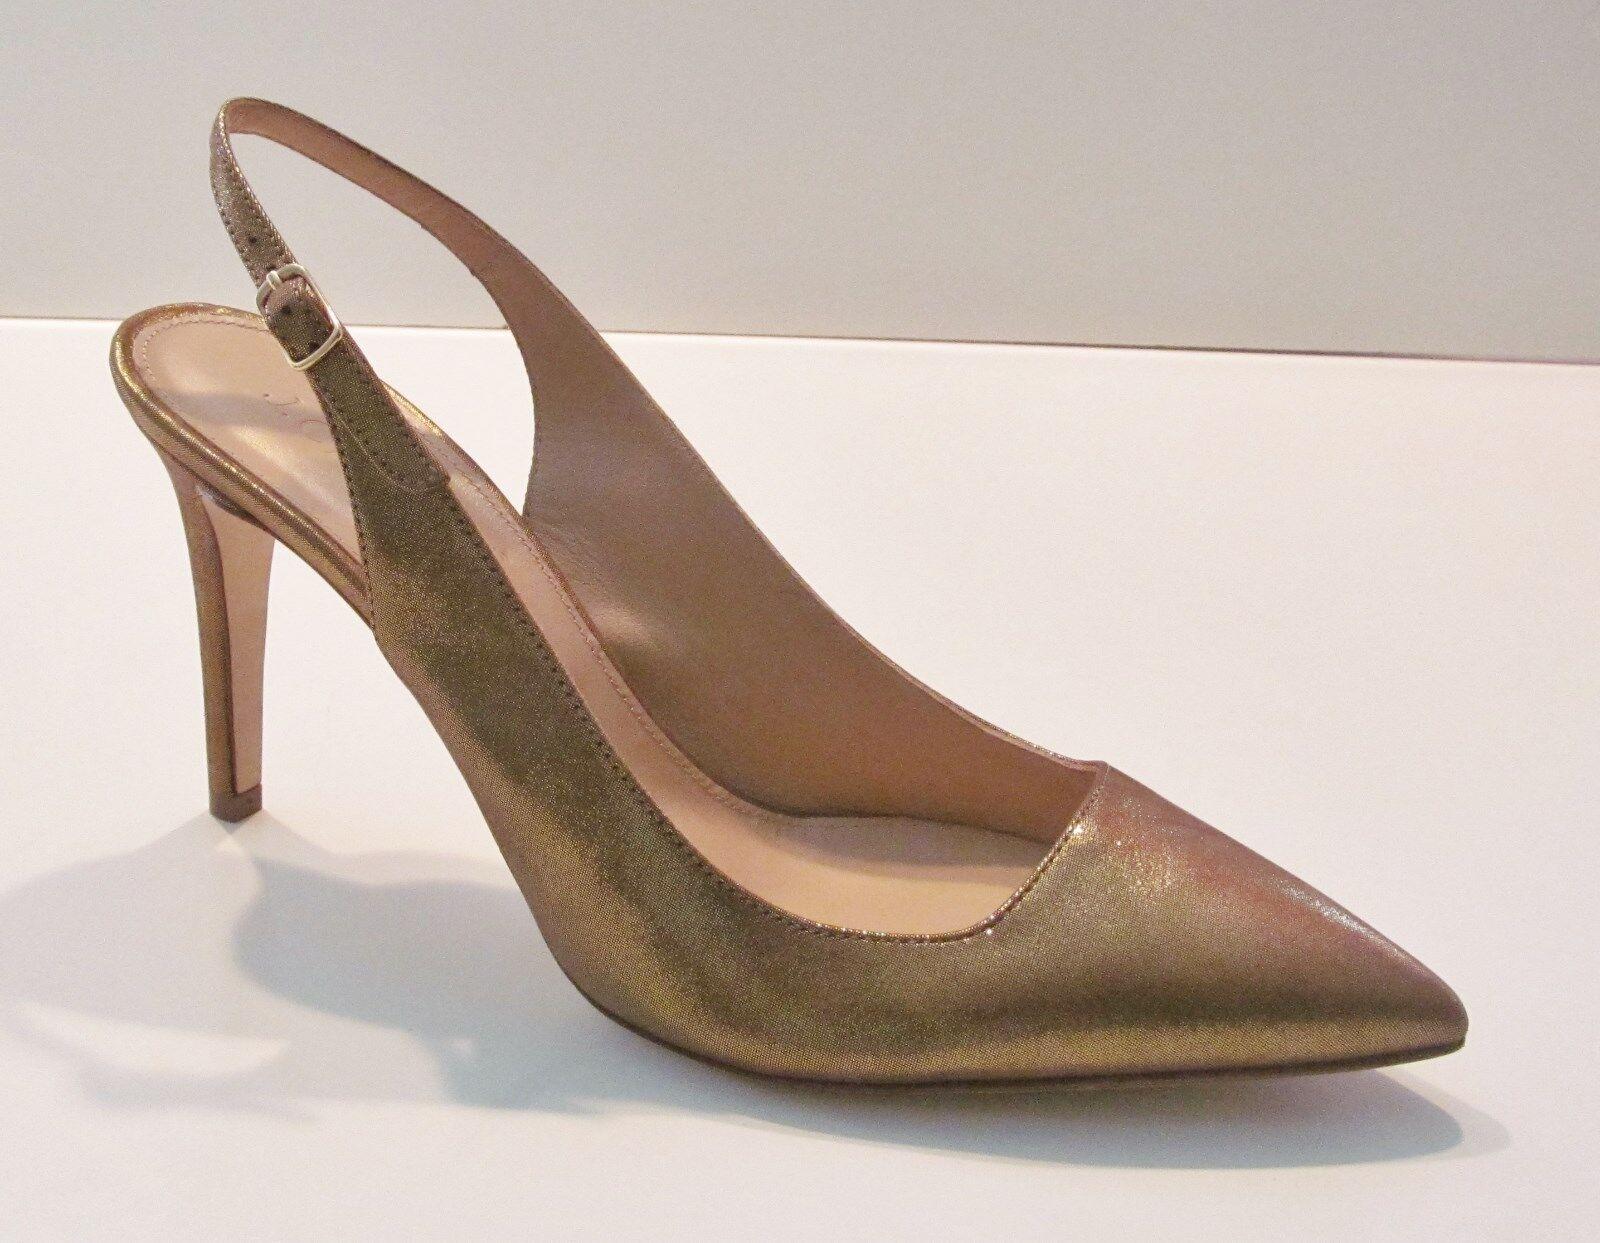 J Crew Metallic Suede Slingback Pumps - size 8.5 heels - Gold Choclolate